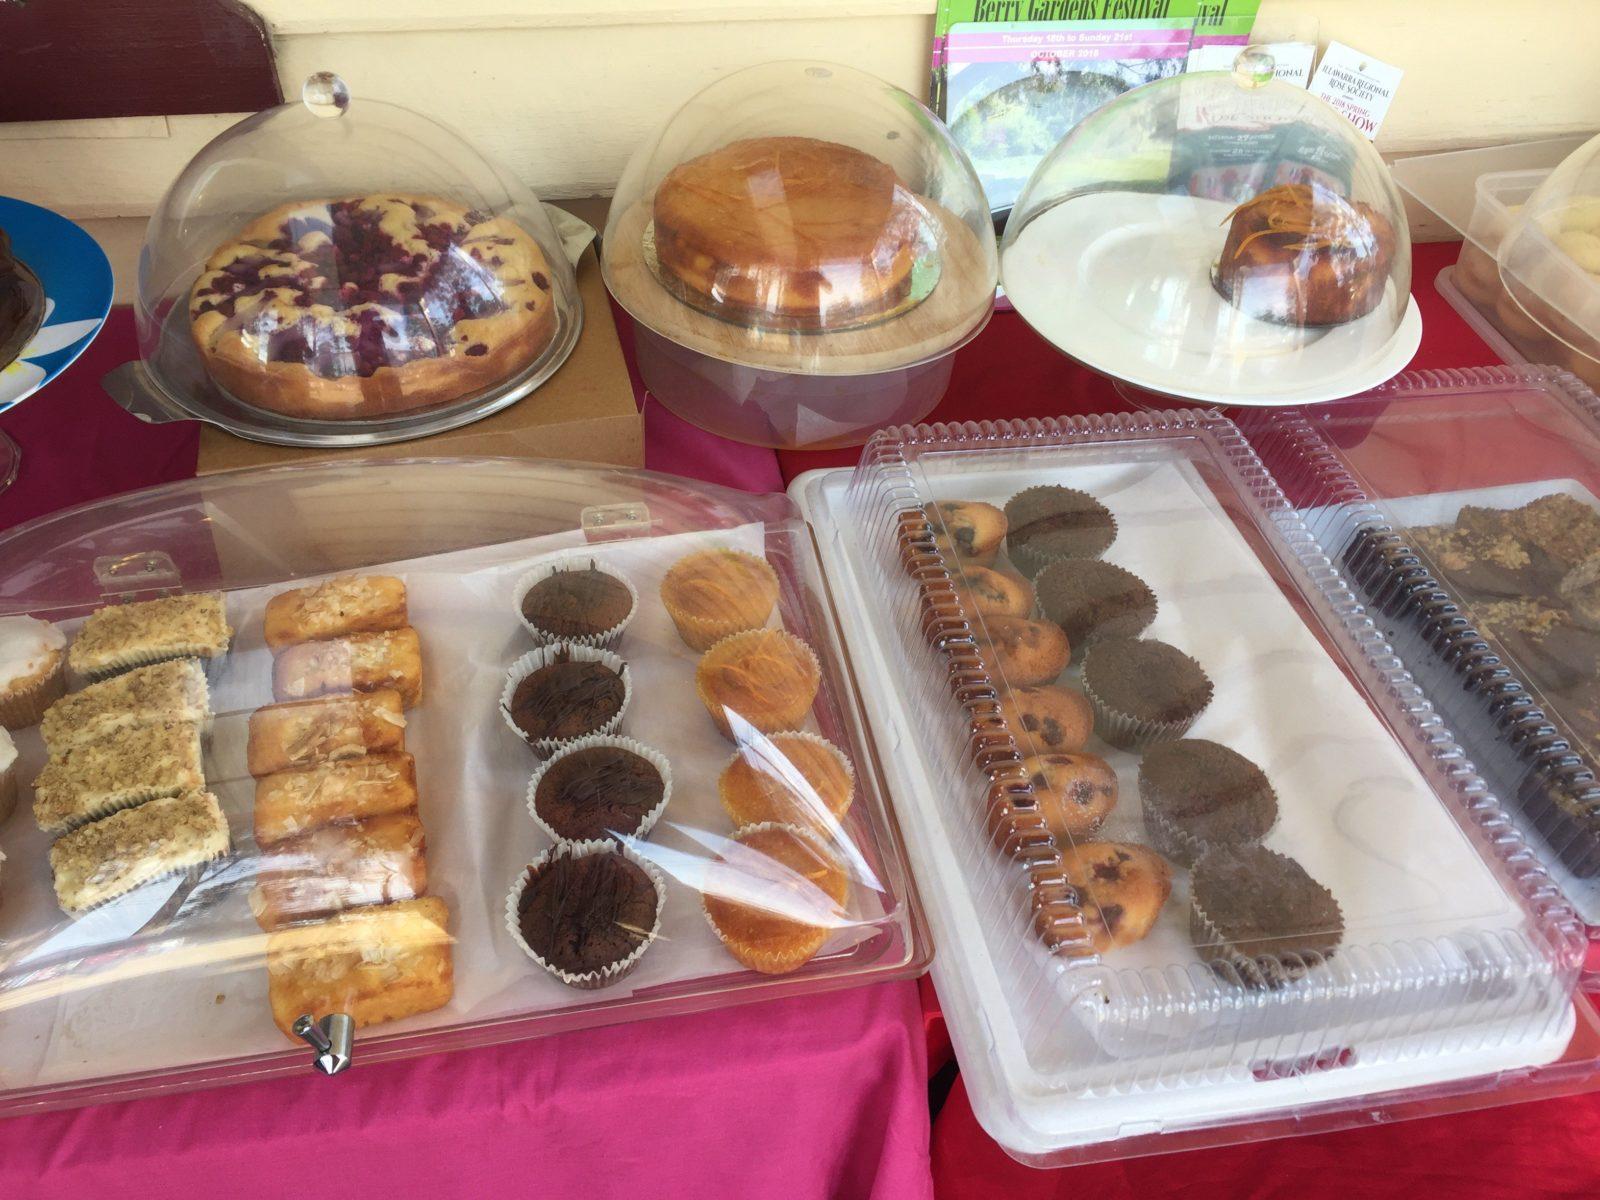 Gluten Free Cakes and Sweet Treats